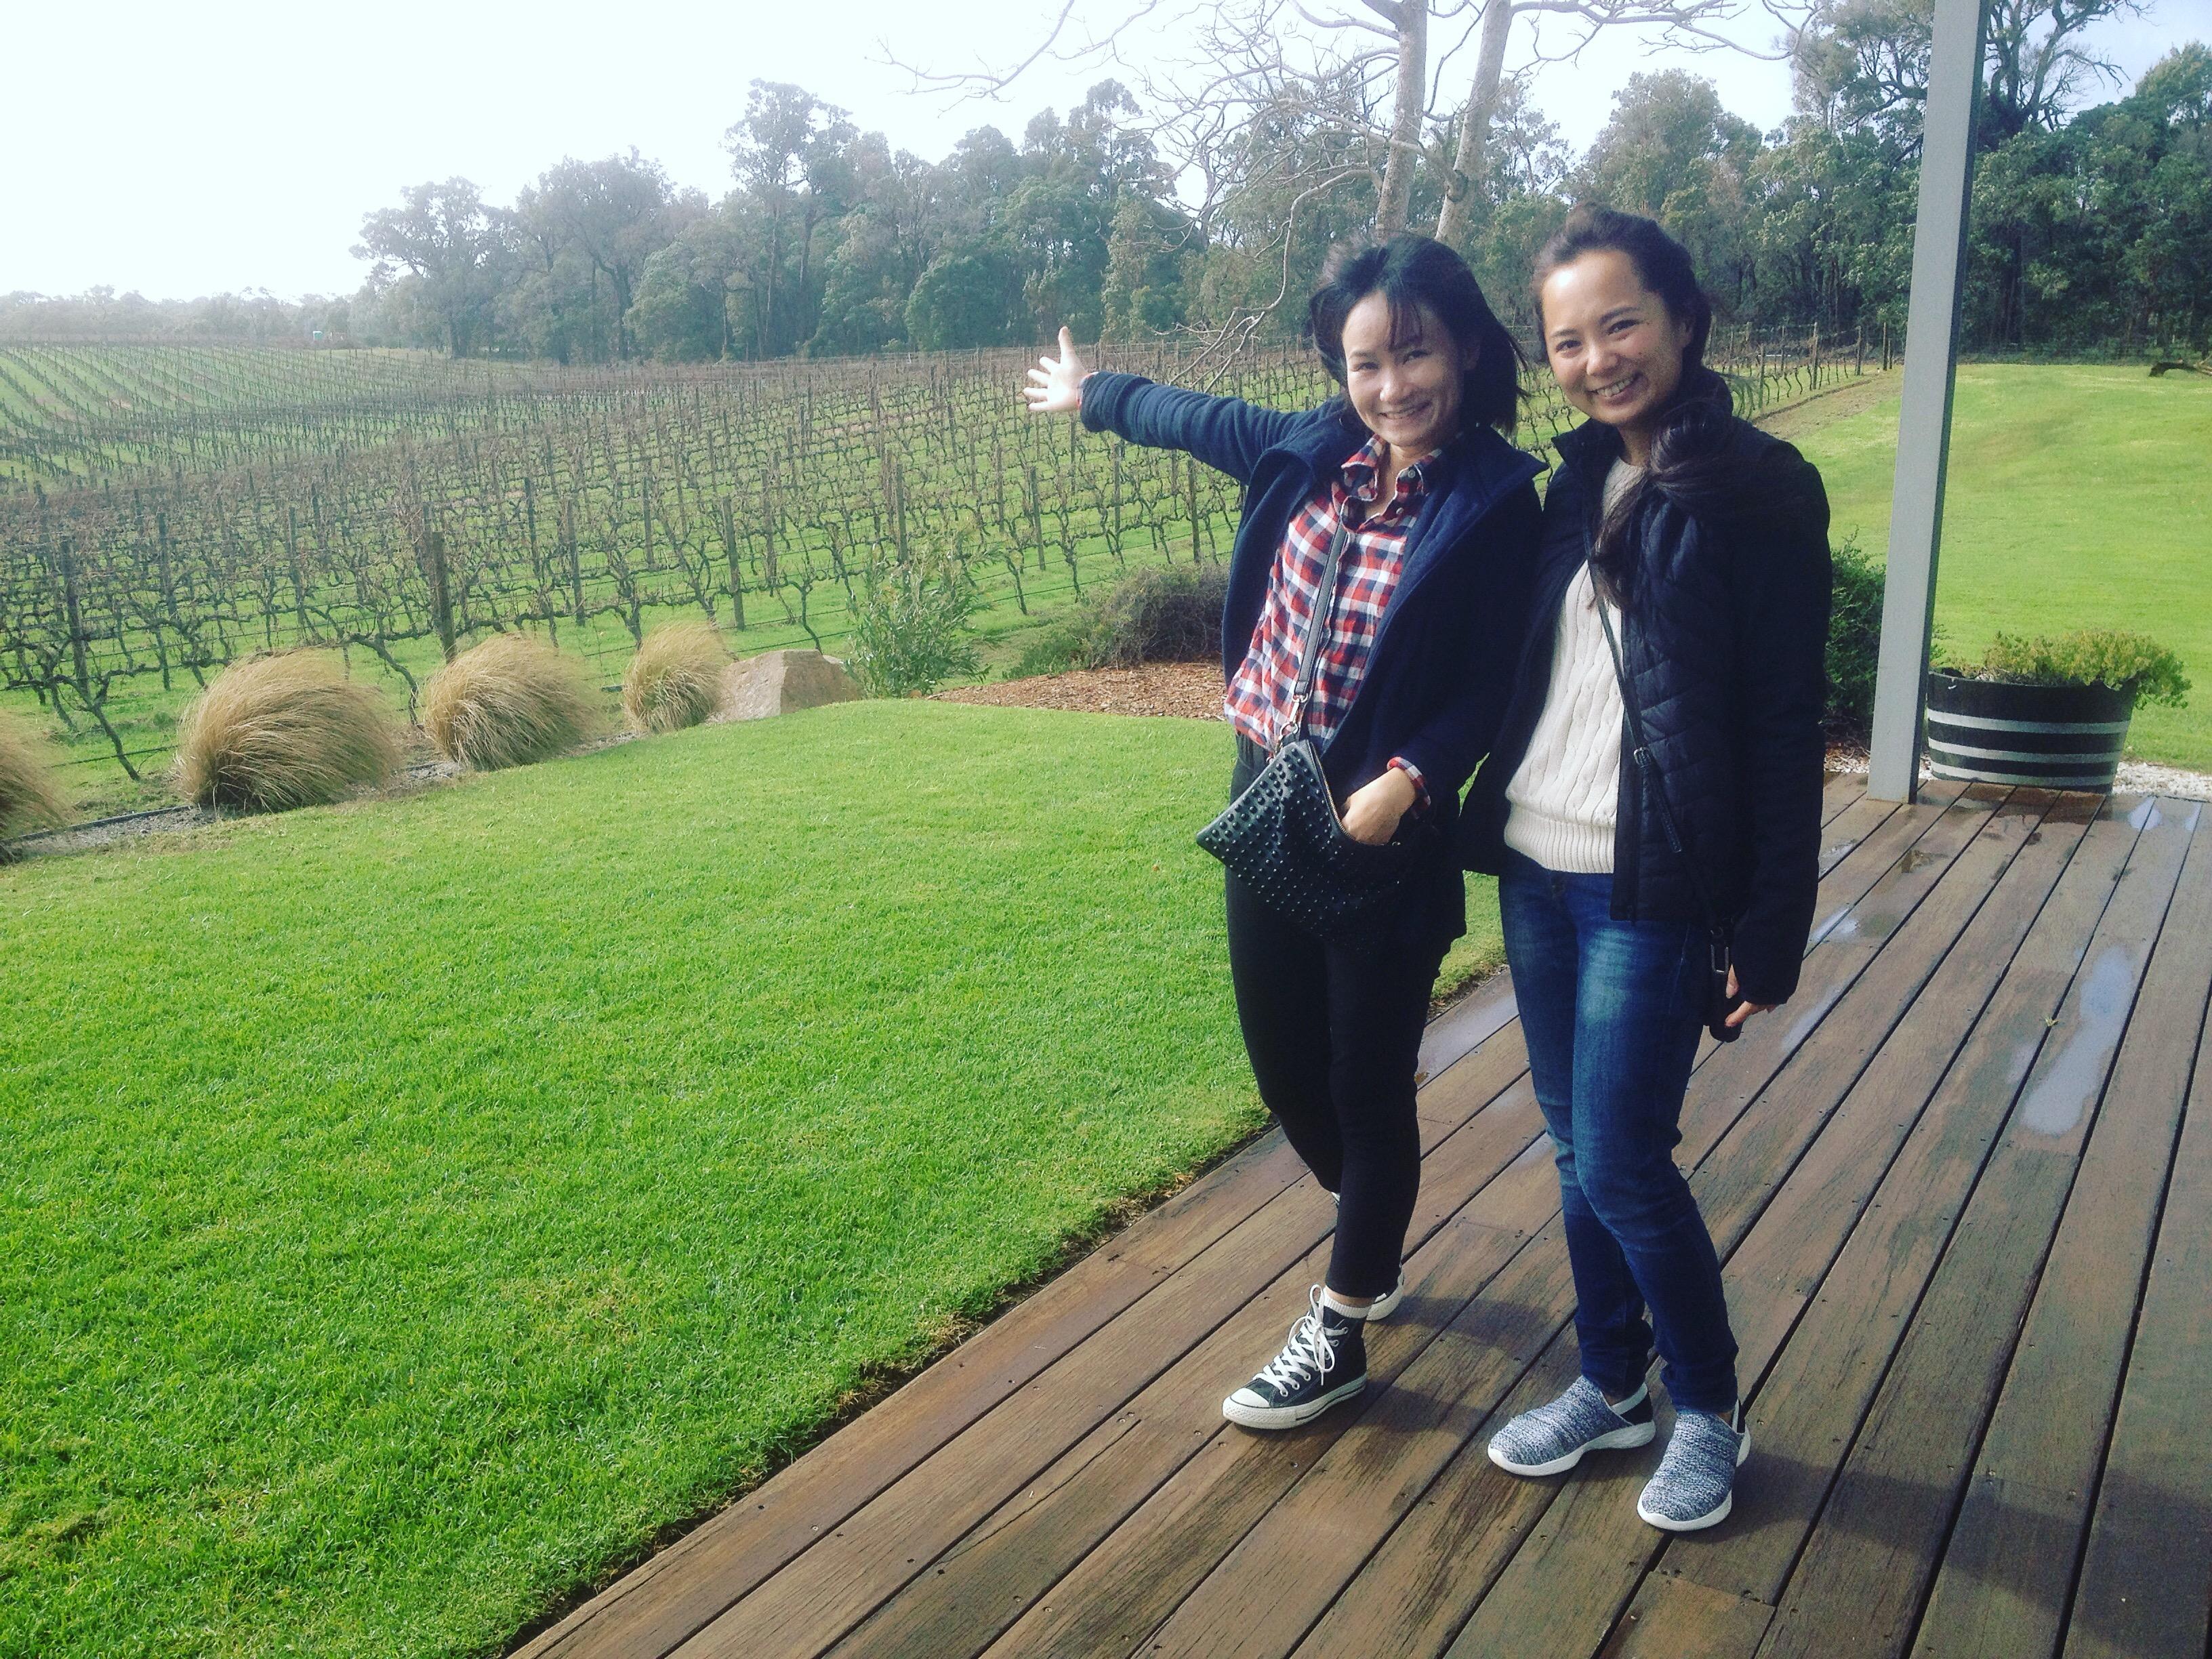 Friends on a wine tour